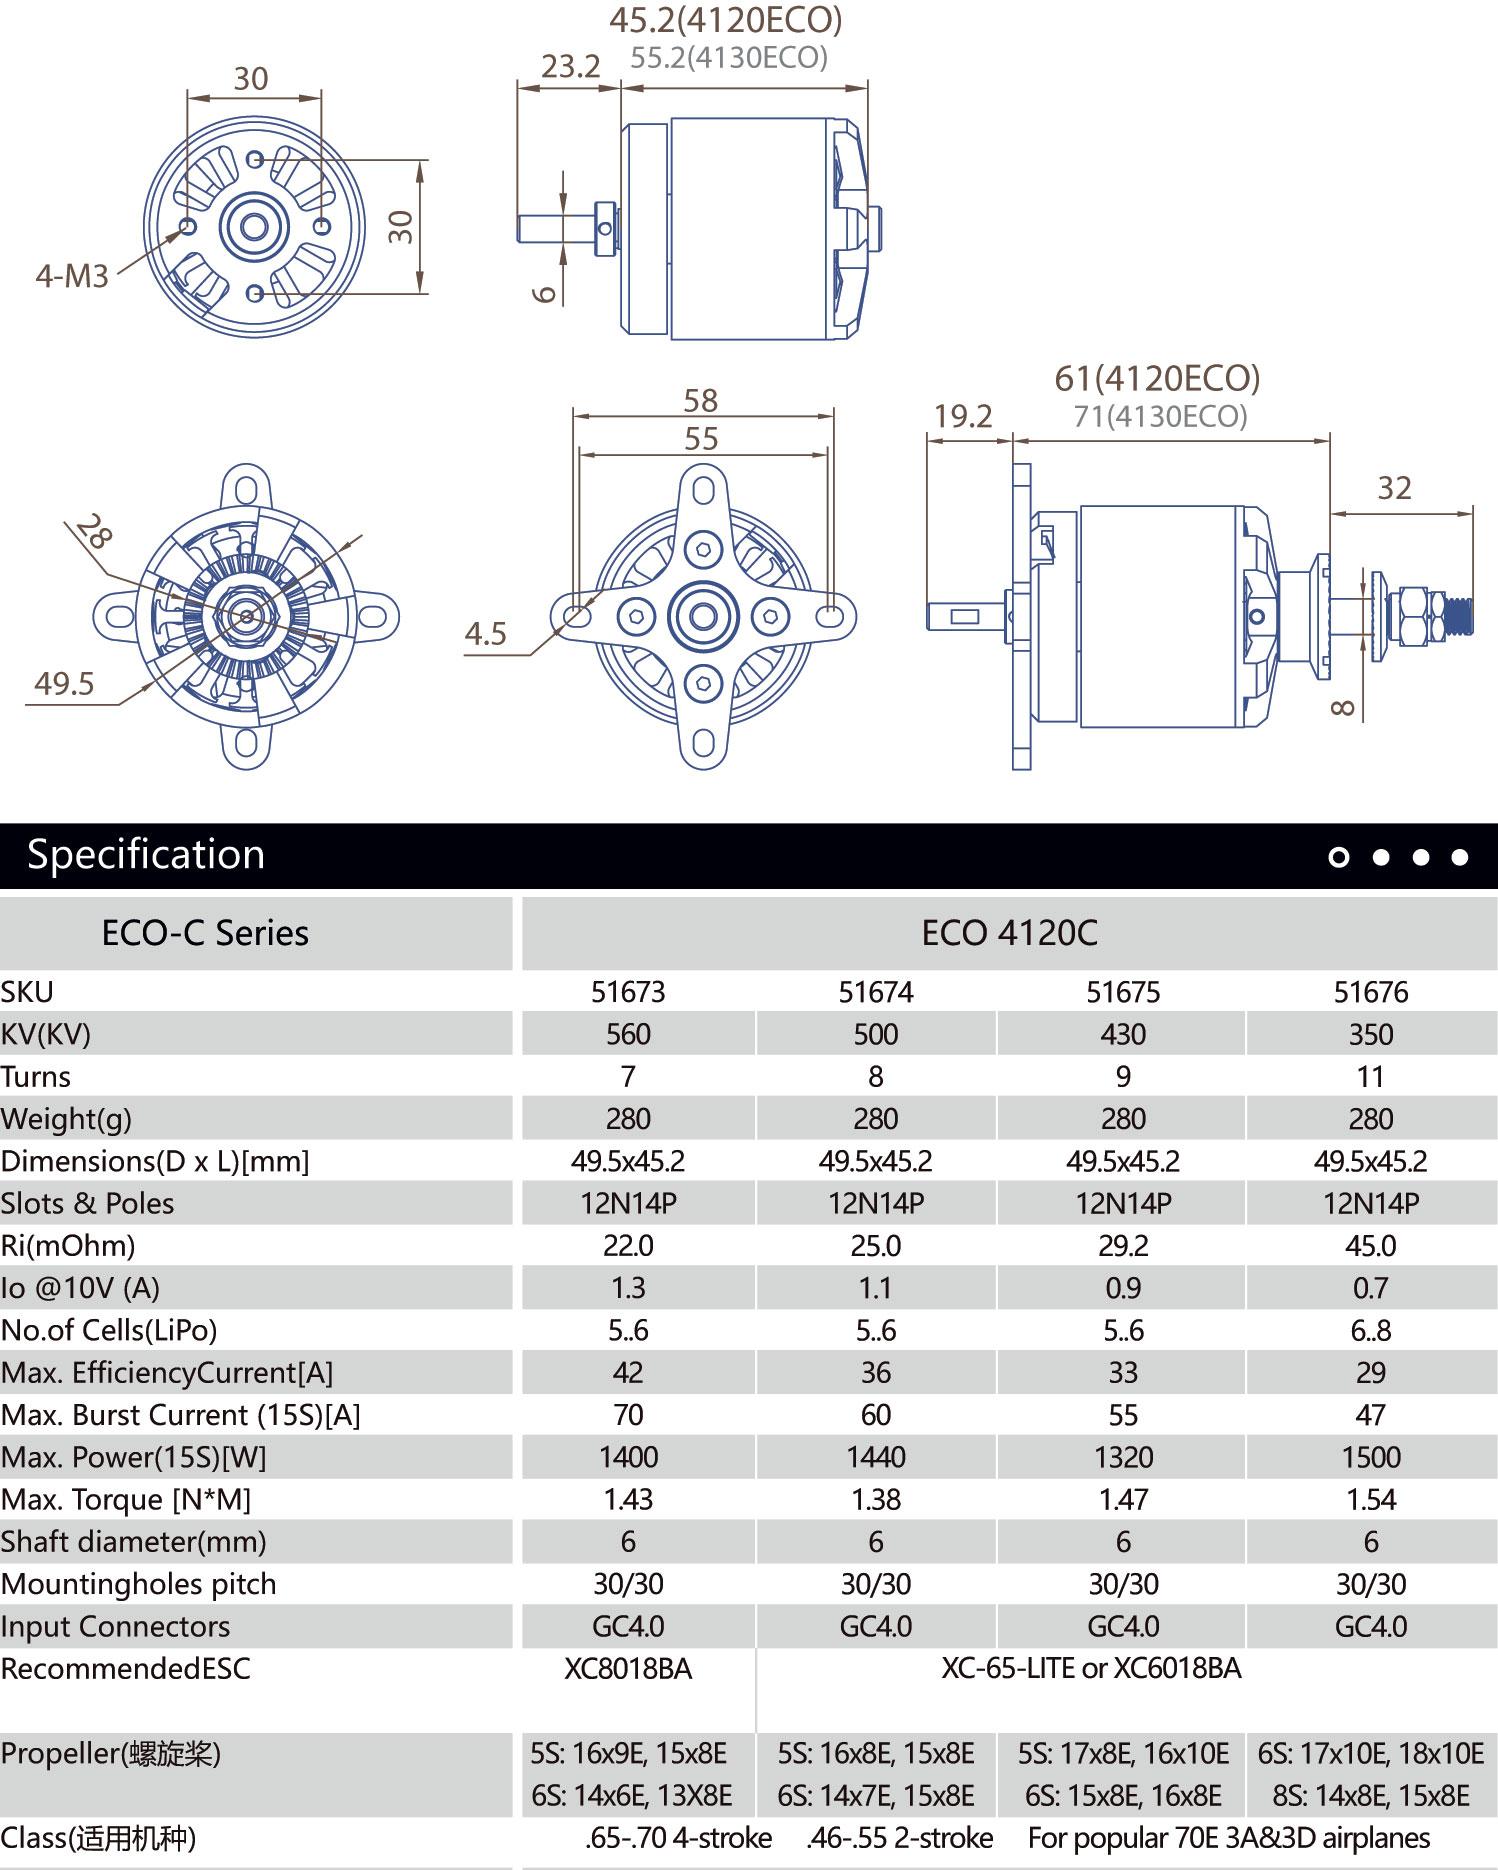 ECO 41C Specifications